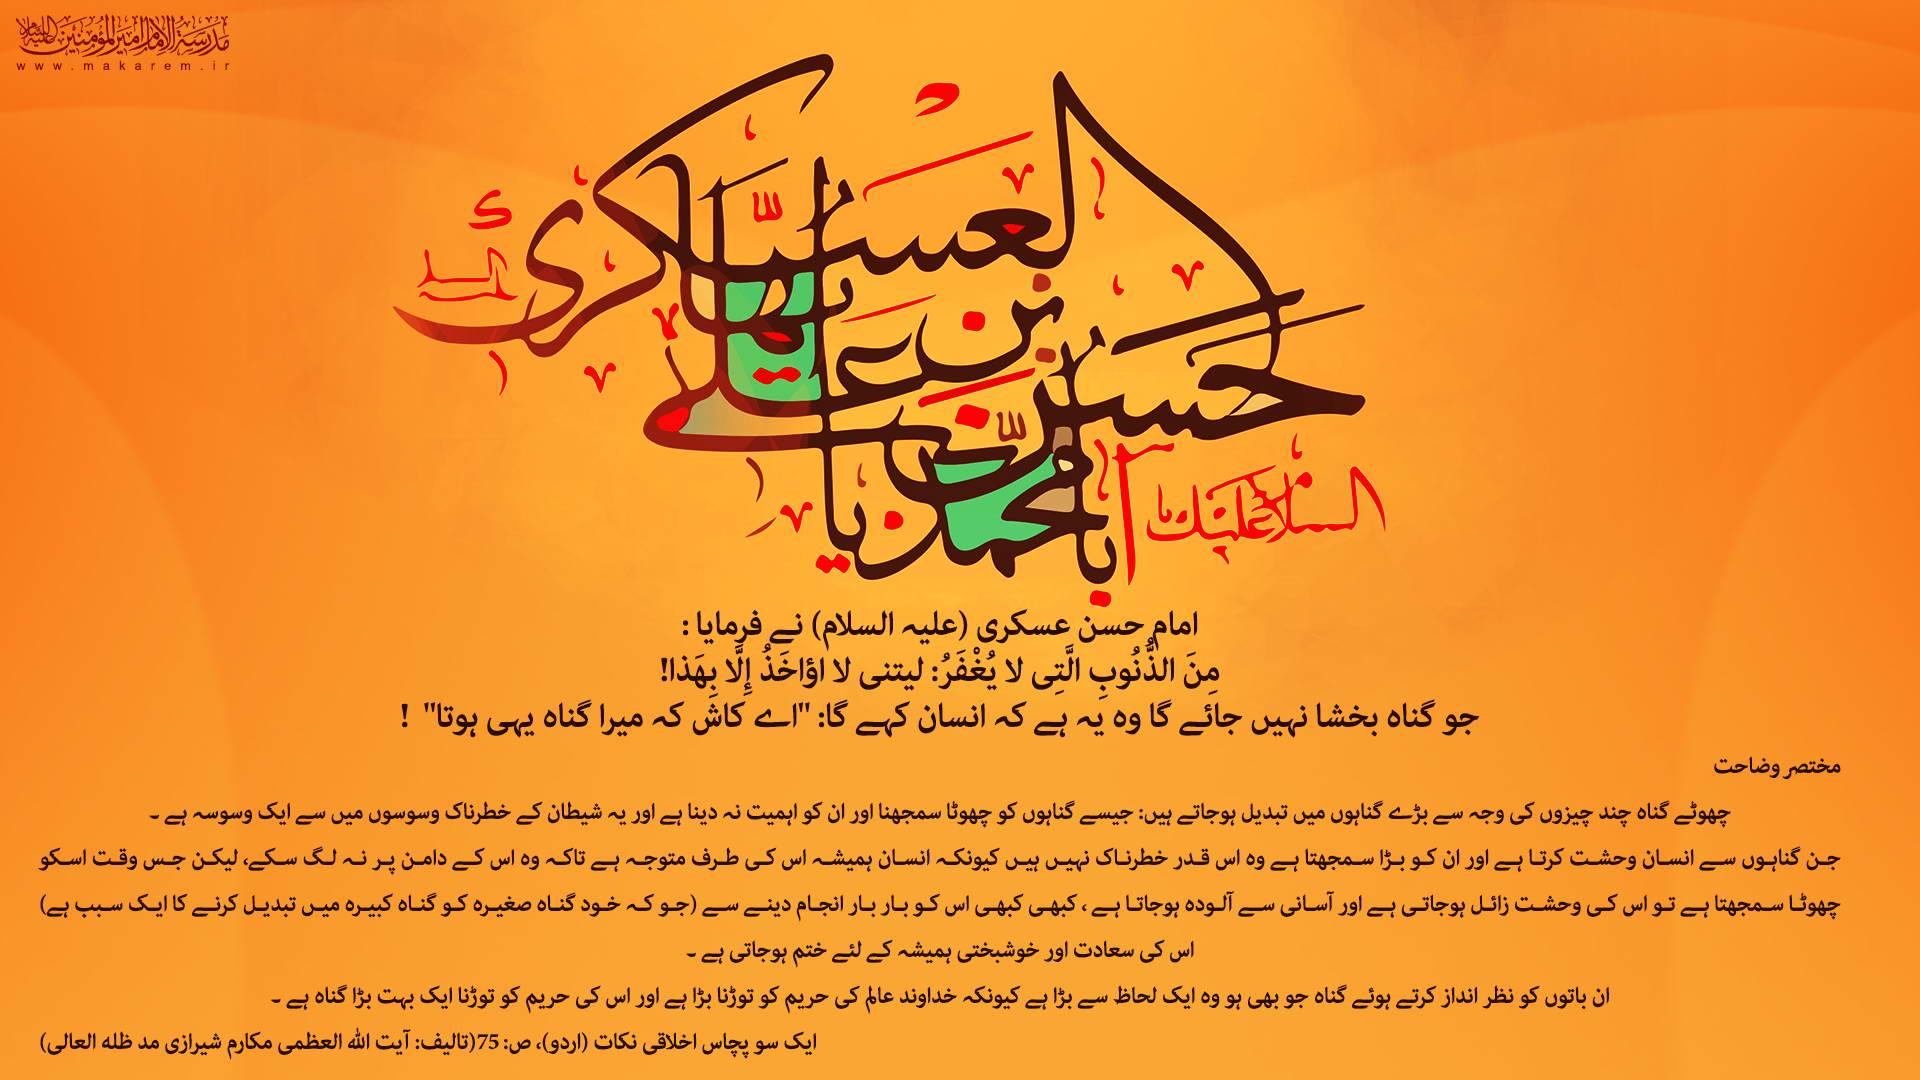 ولادت امام عسکری علیه السلام-مدرسه الامام امیر المومنین (ع)